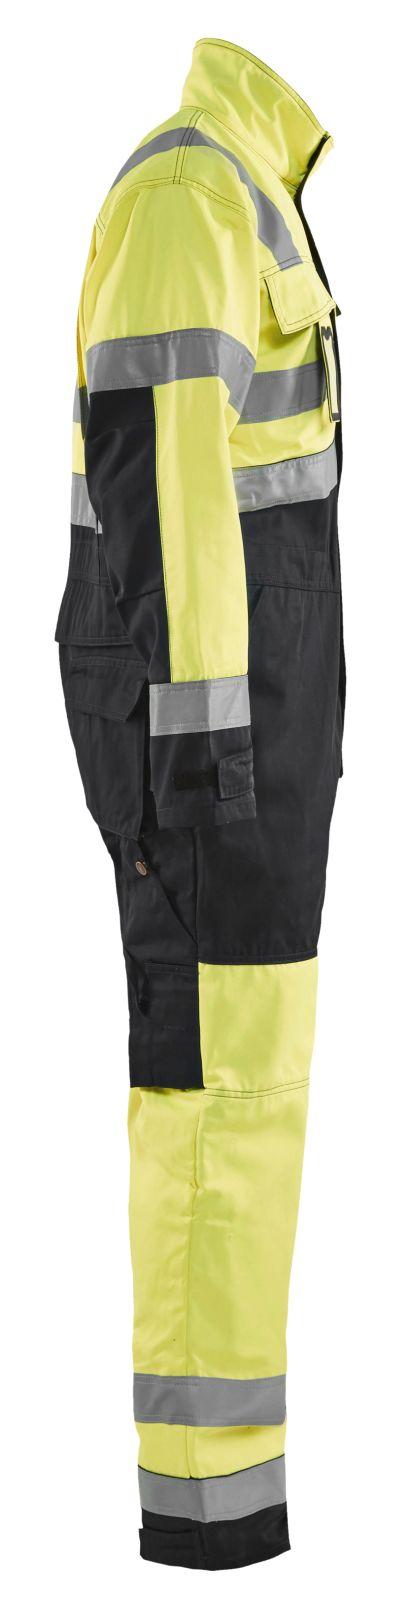 Blaklader Overalls 63731804 High Vis geel-zwart(3399)